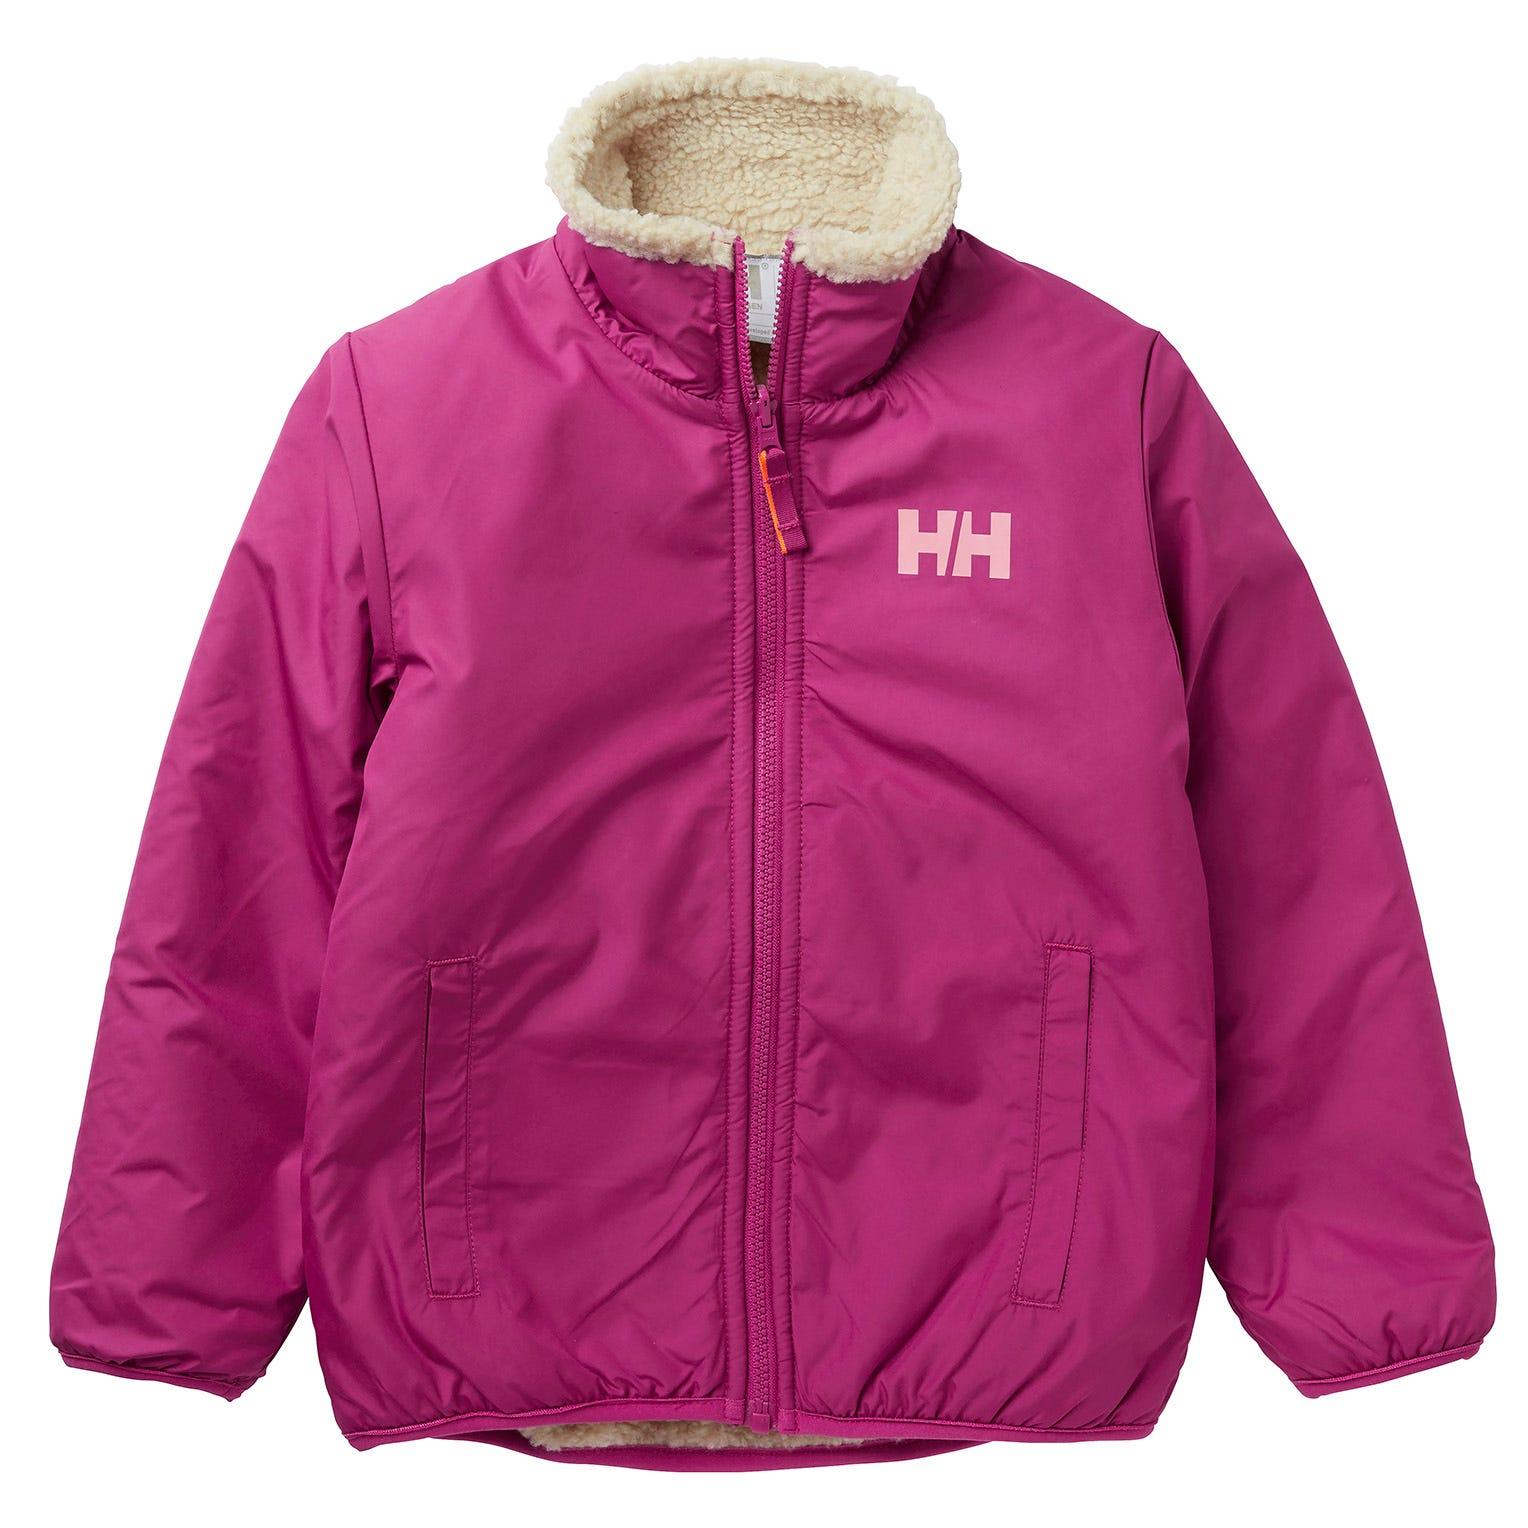 Helly Hansen Kids Reversible Pile Jacket Parka Yellow 110/5